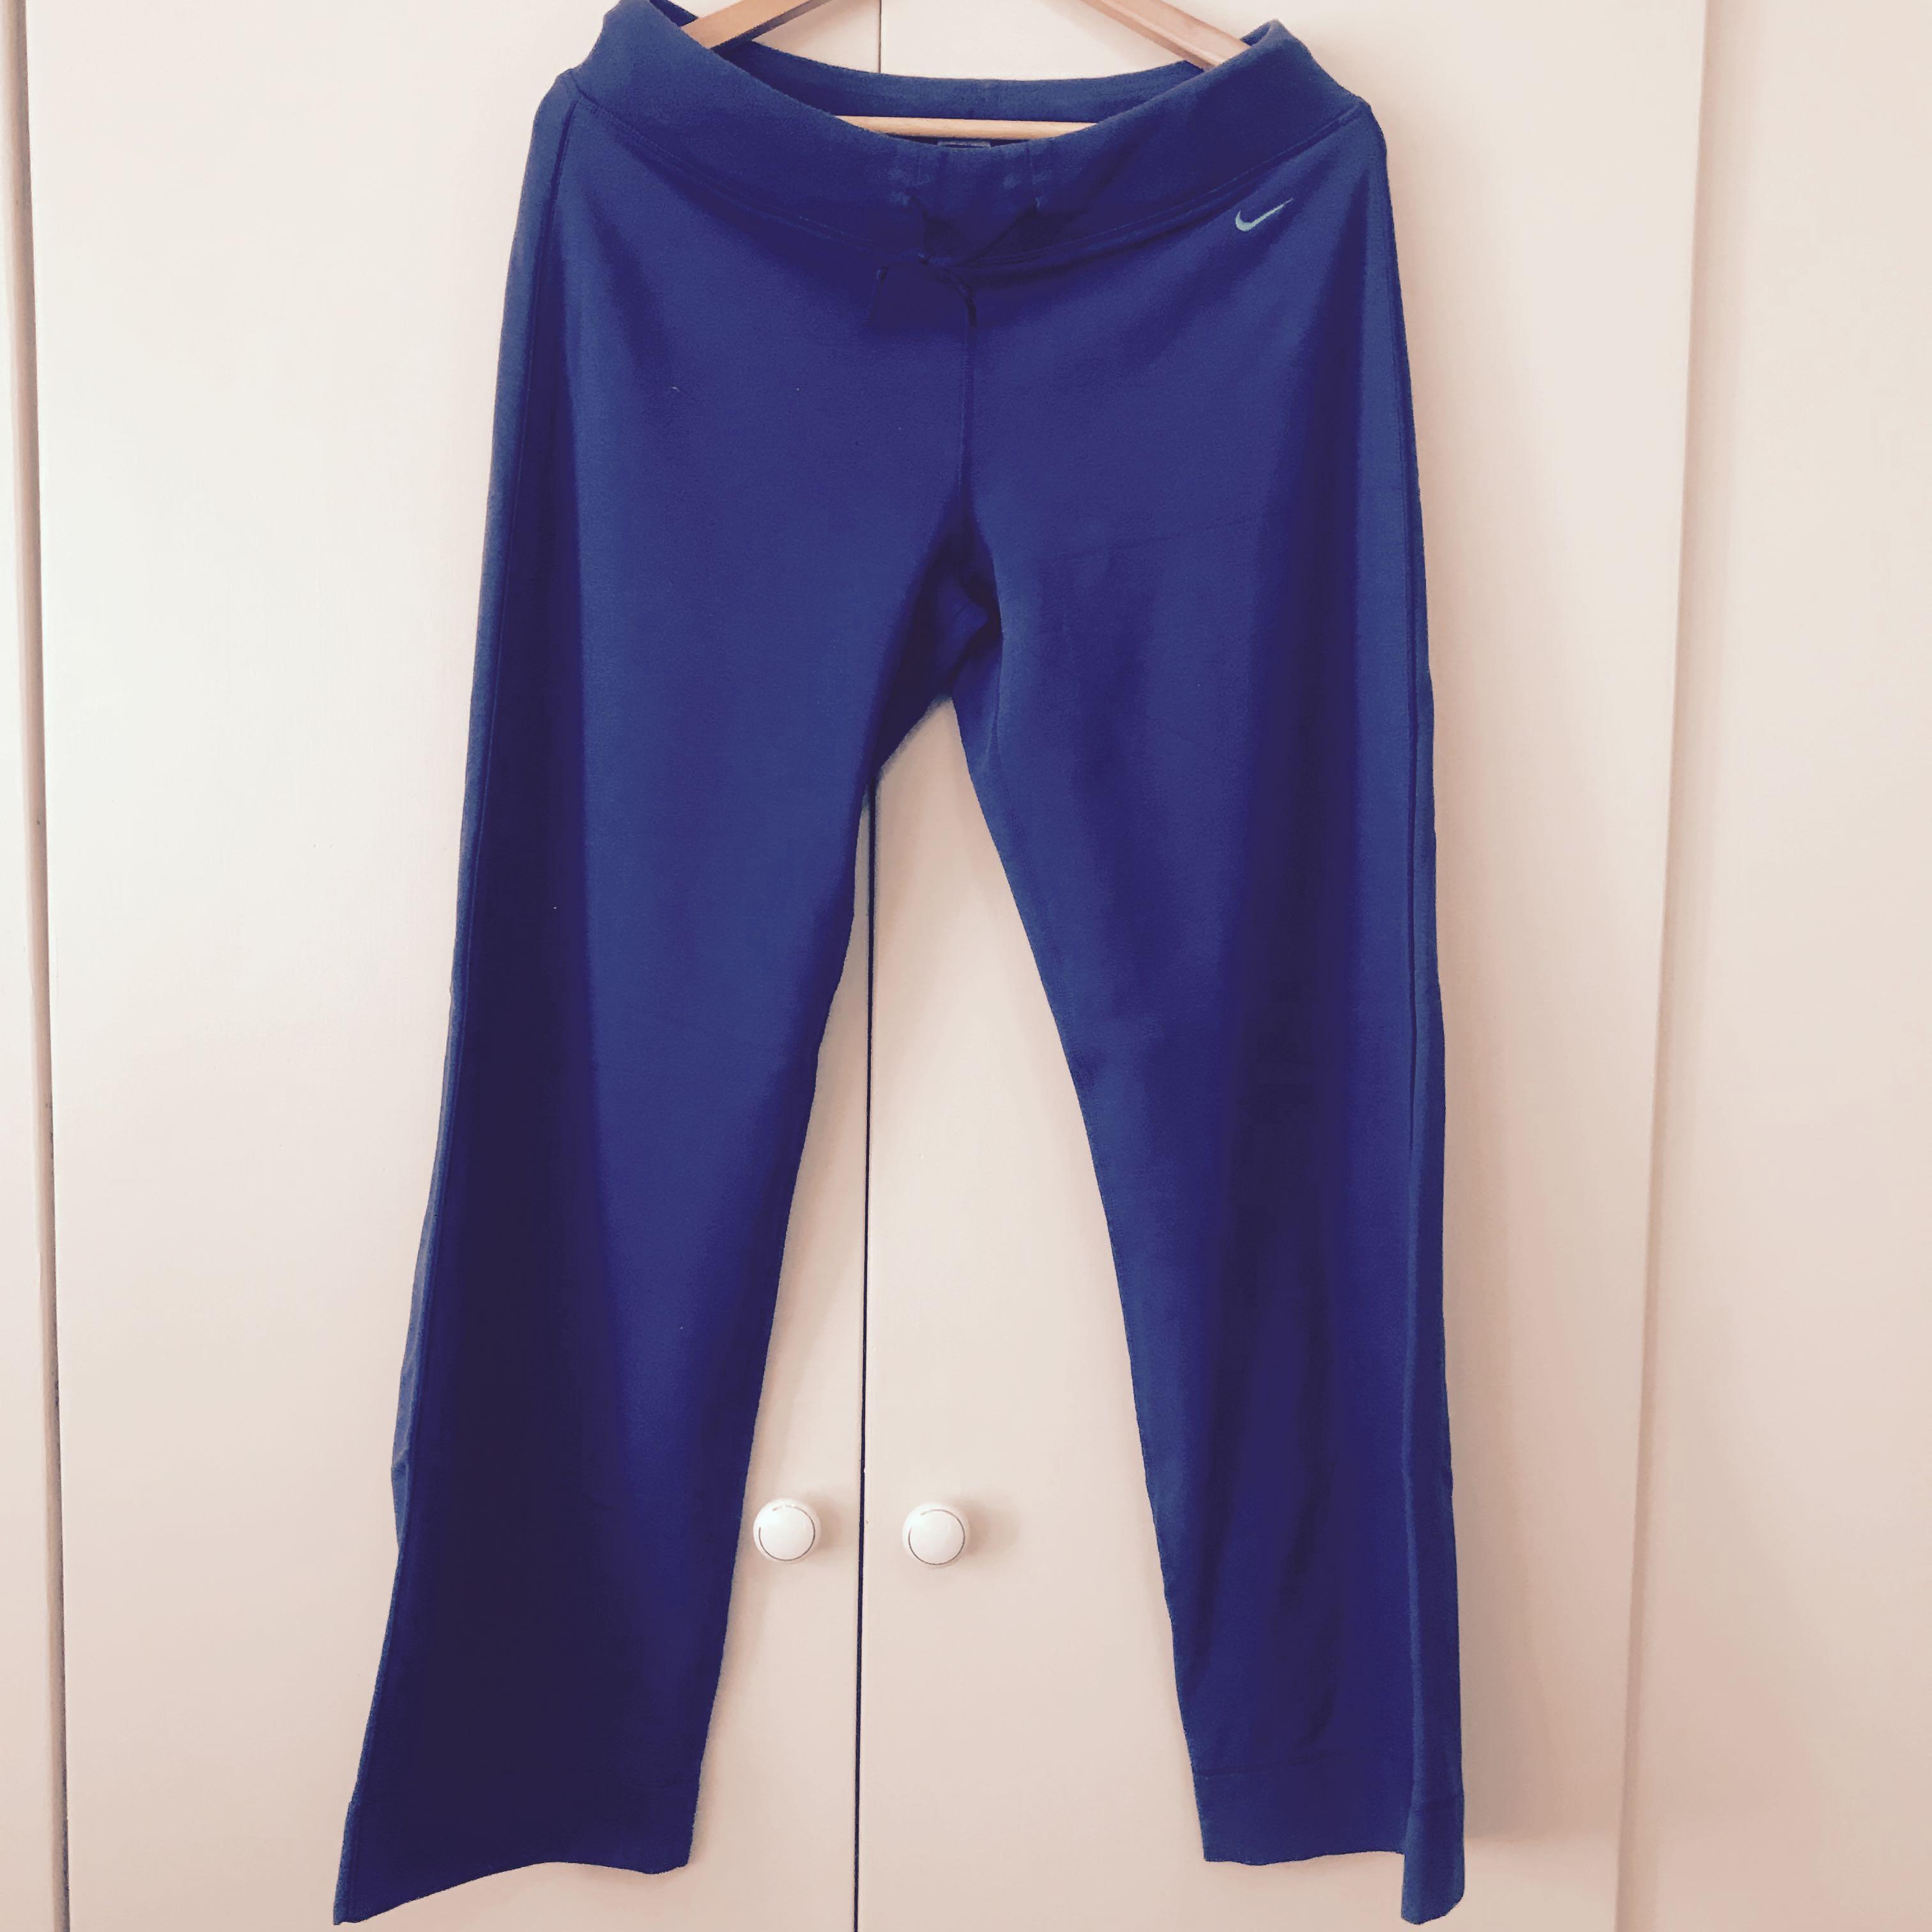 7da8942af589 on Pants size Jogging Carousell Plus Nike Jeans Fashion Women s Pants  Shorts Clothes amp  pPwa55q